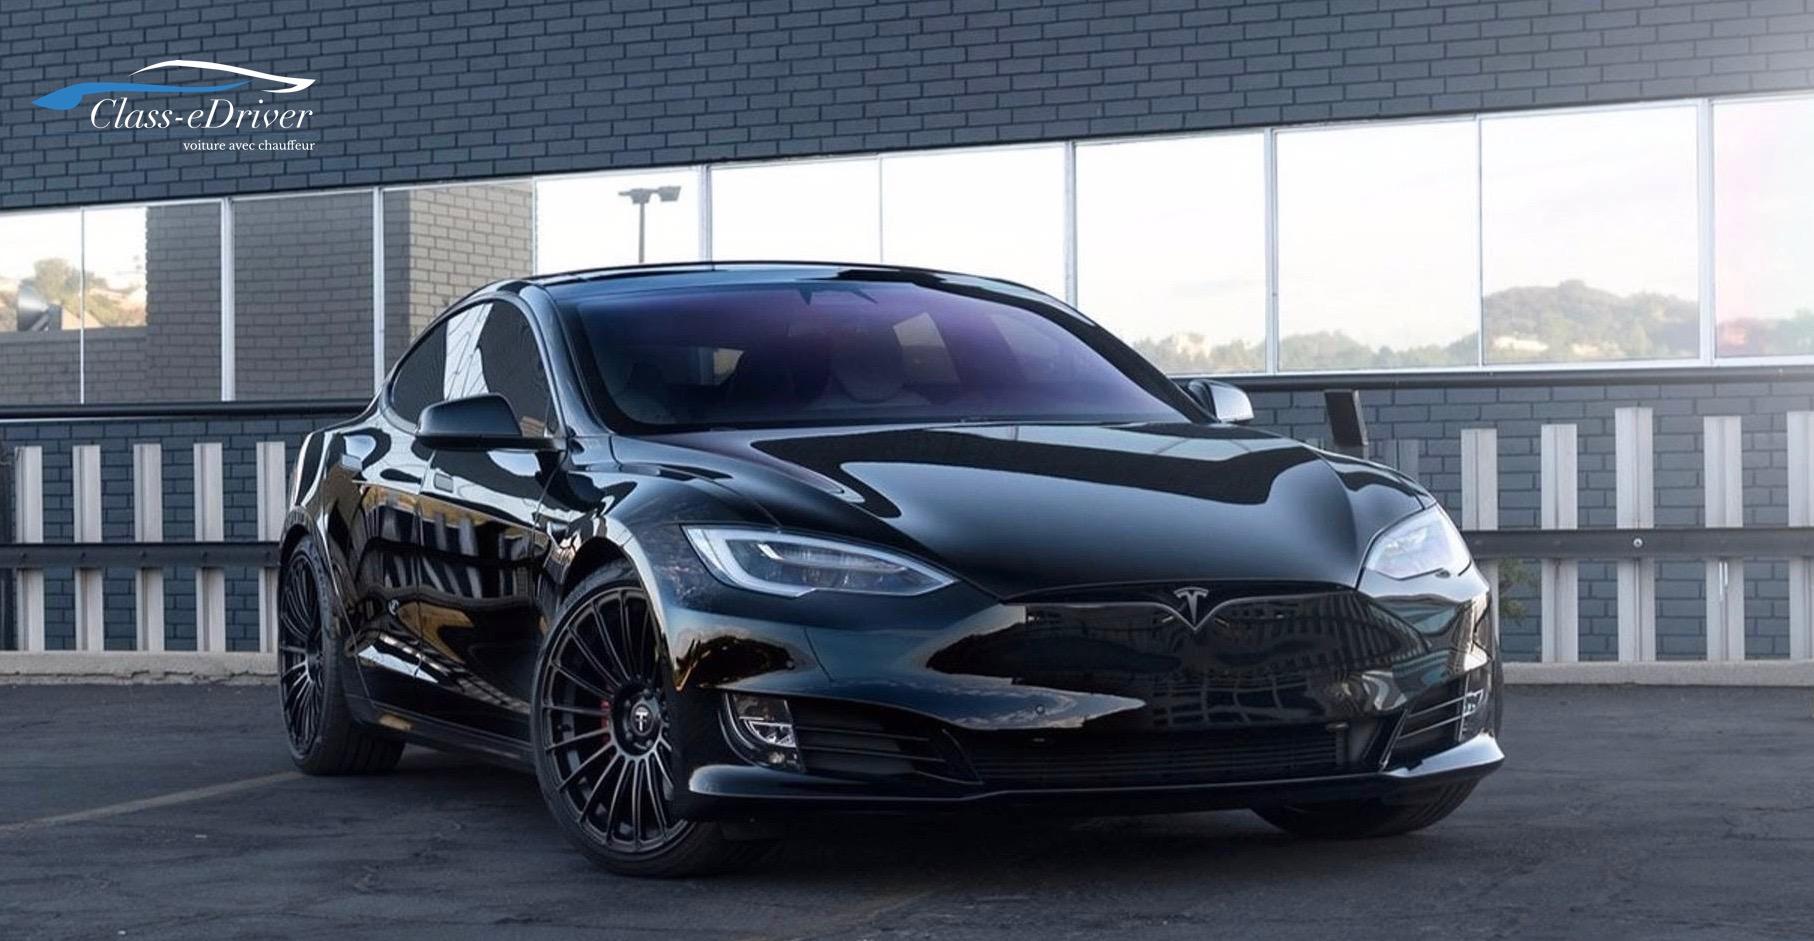 Chauffeur car service Tesla